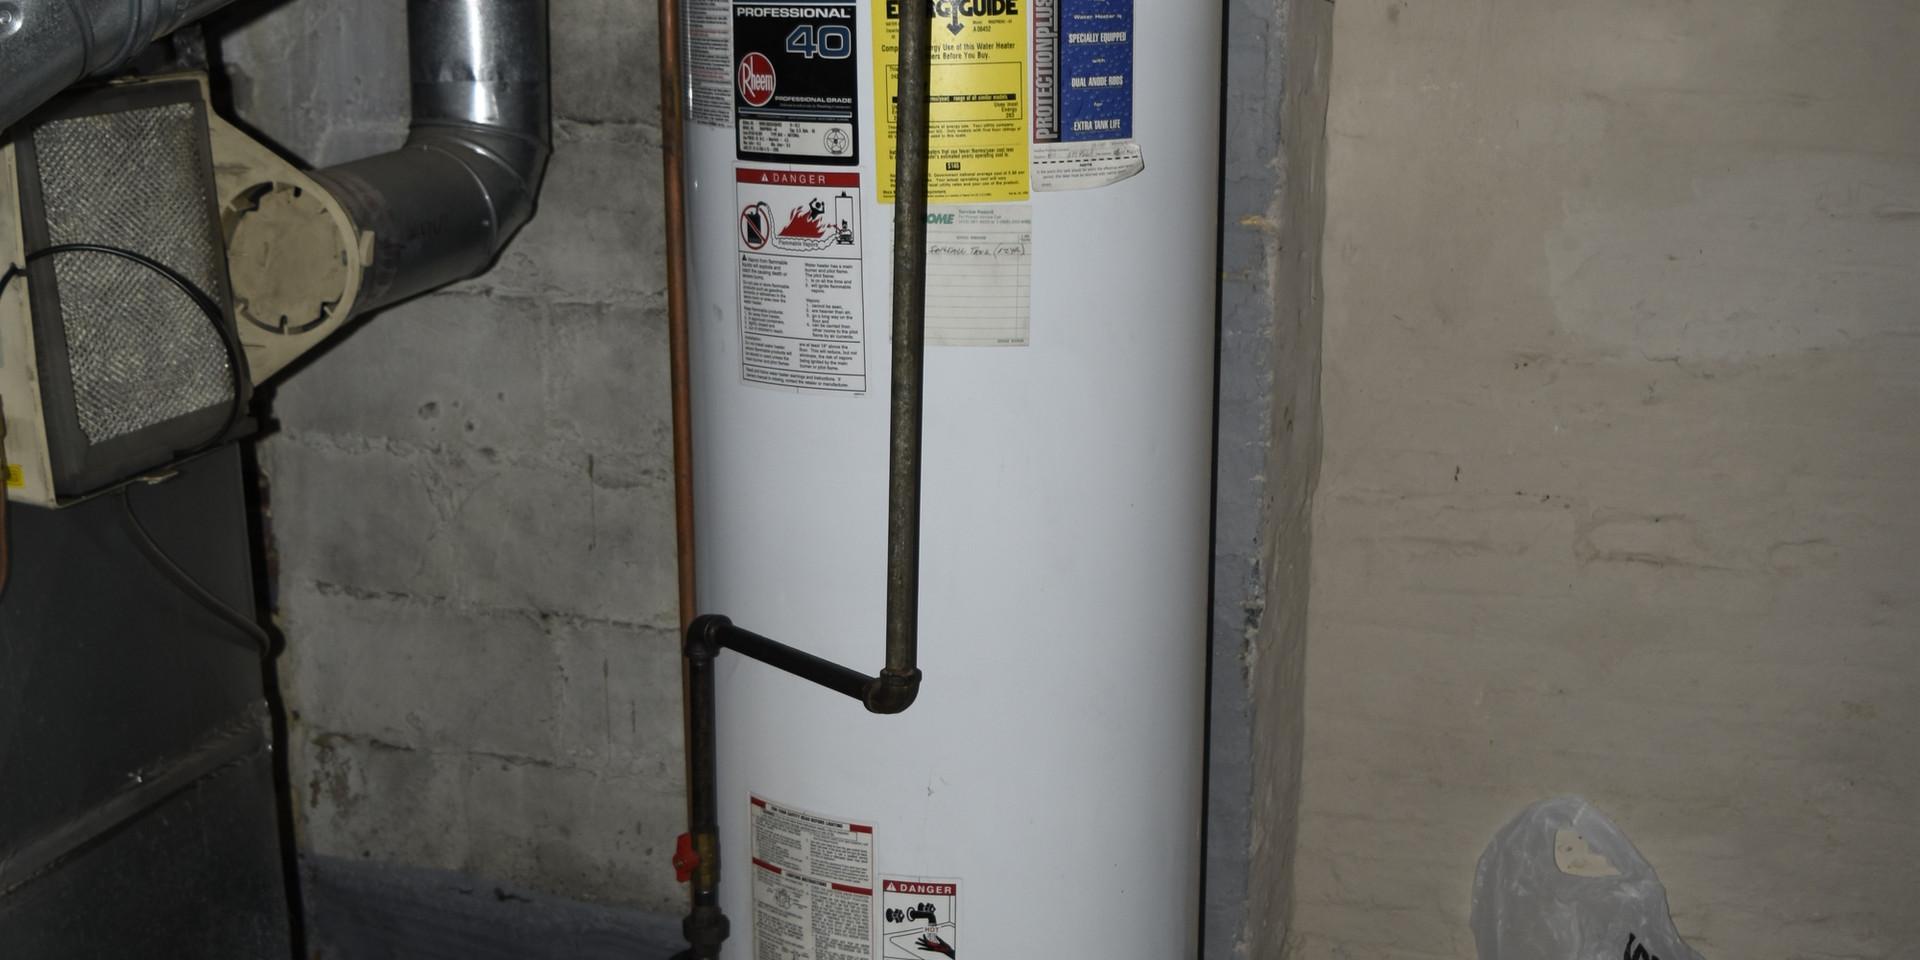 21 Hot Water Heater.jpg